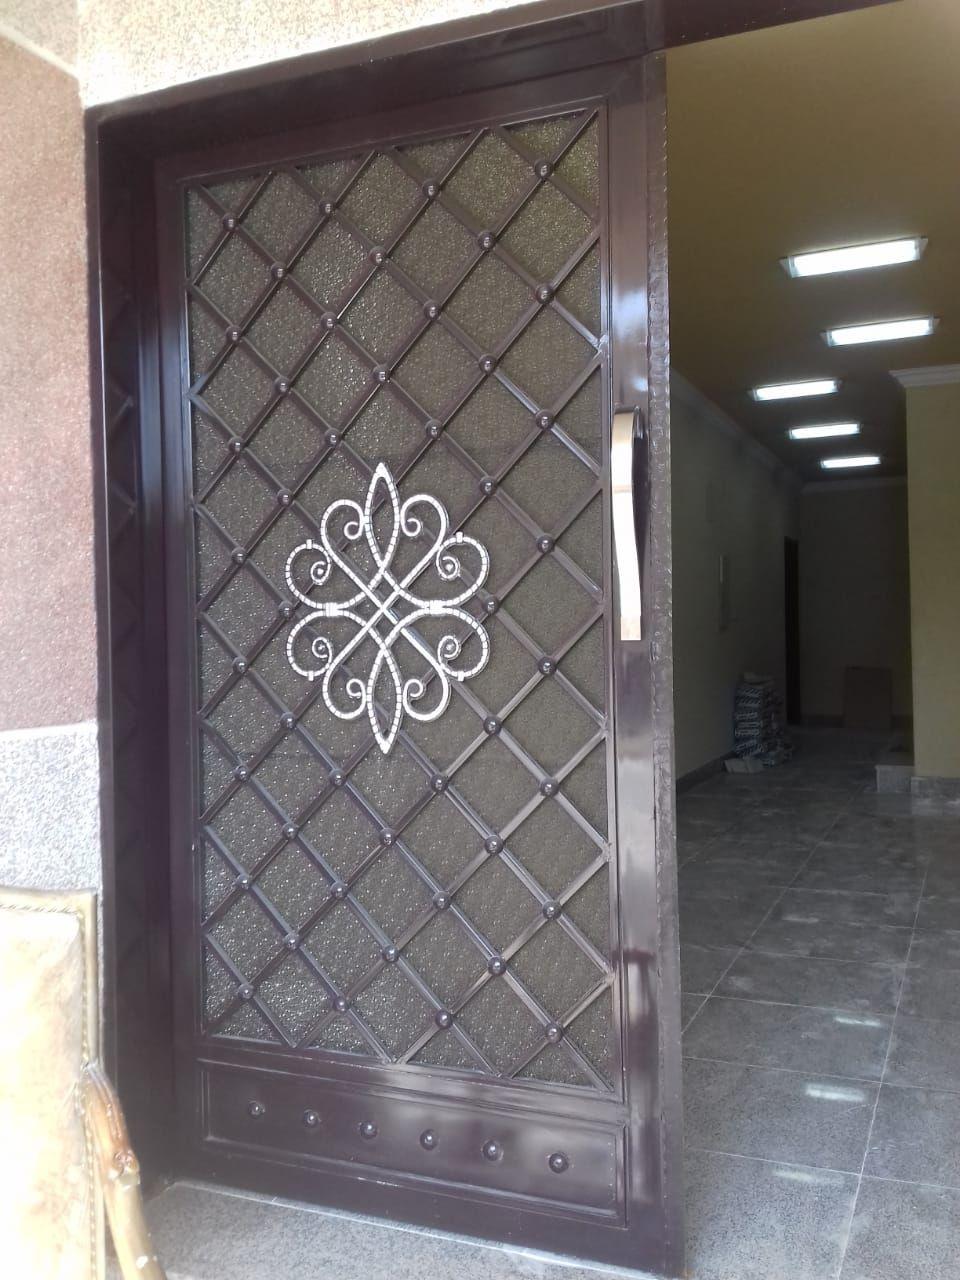 Pin By Tent Ksa On مقاولات عامة الرياض 0530608113 Home Decor Decor Furniture